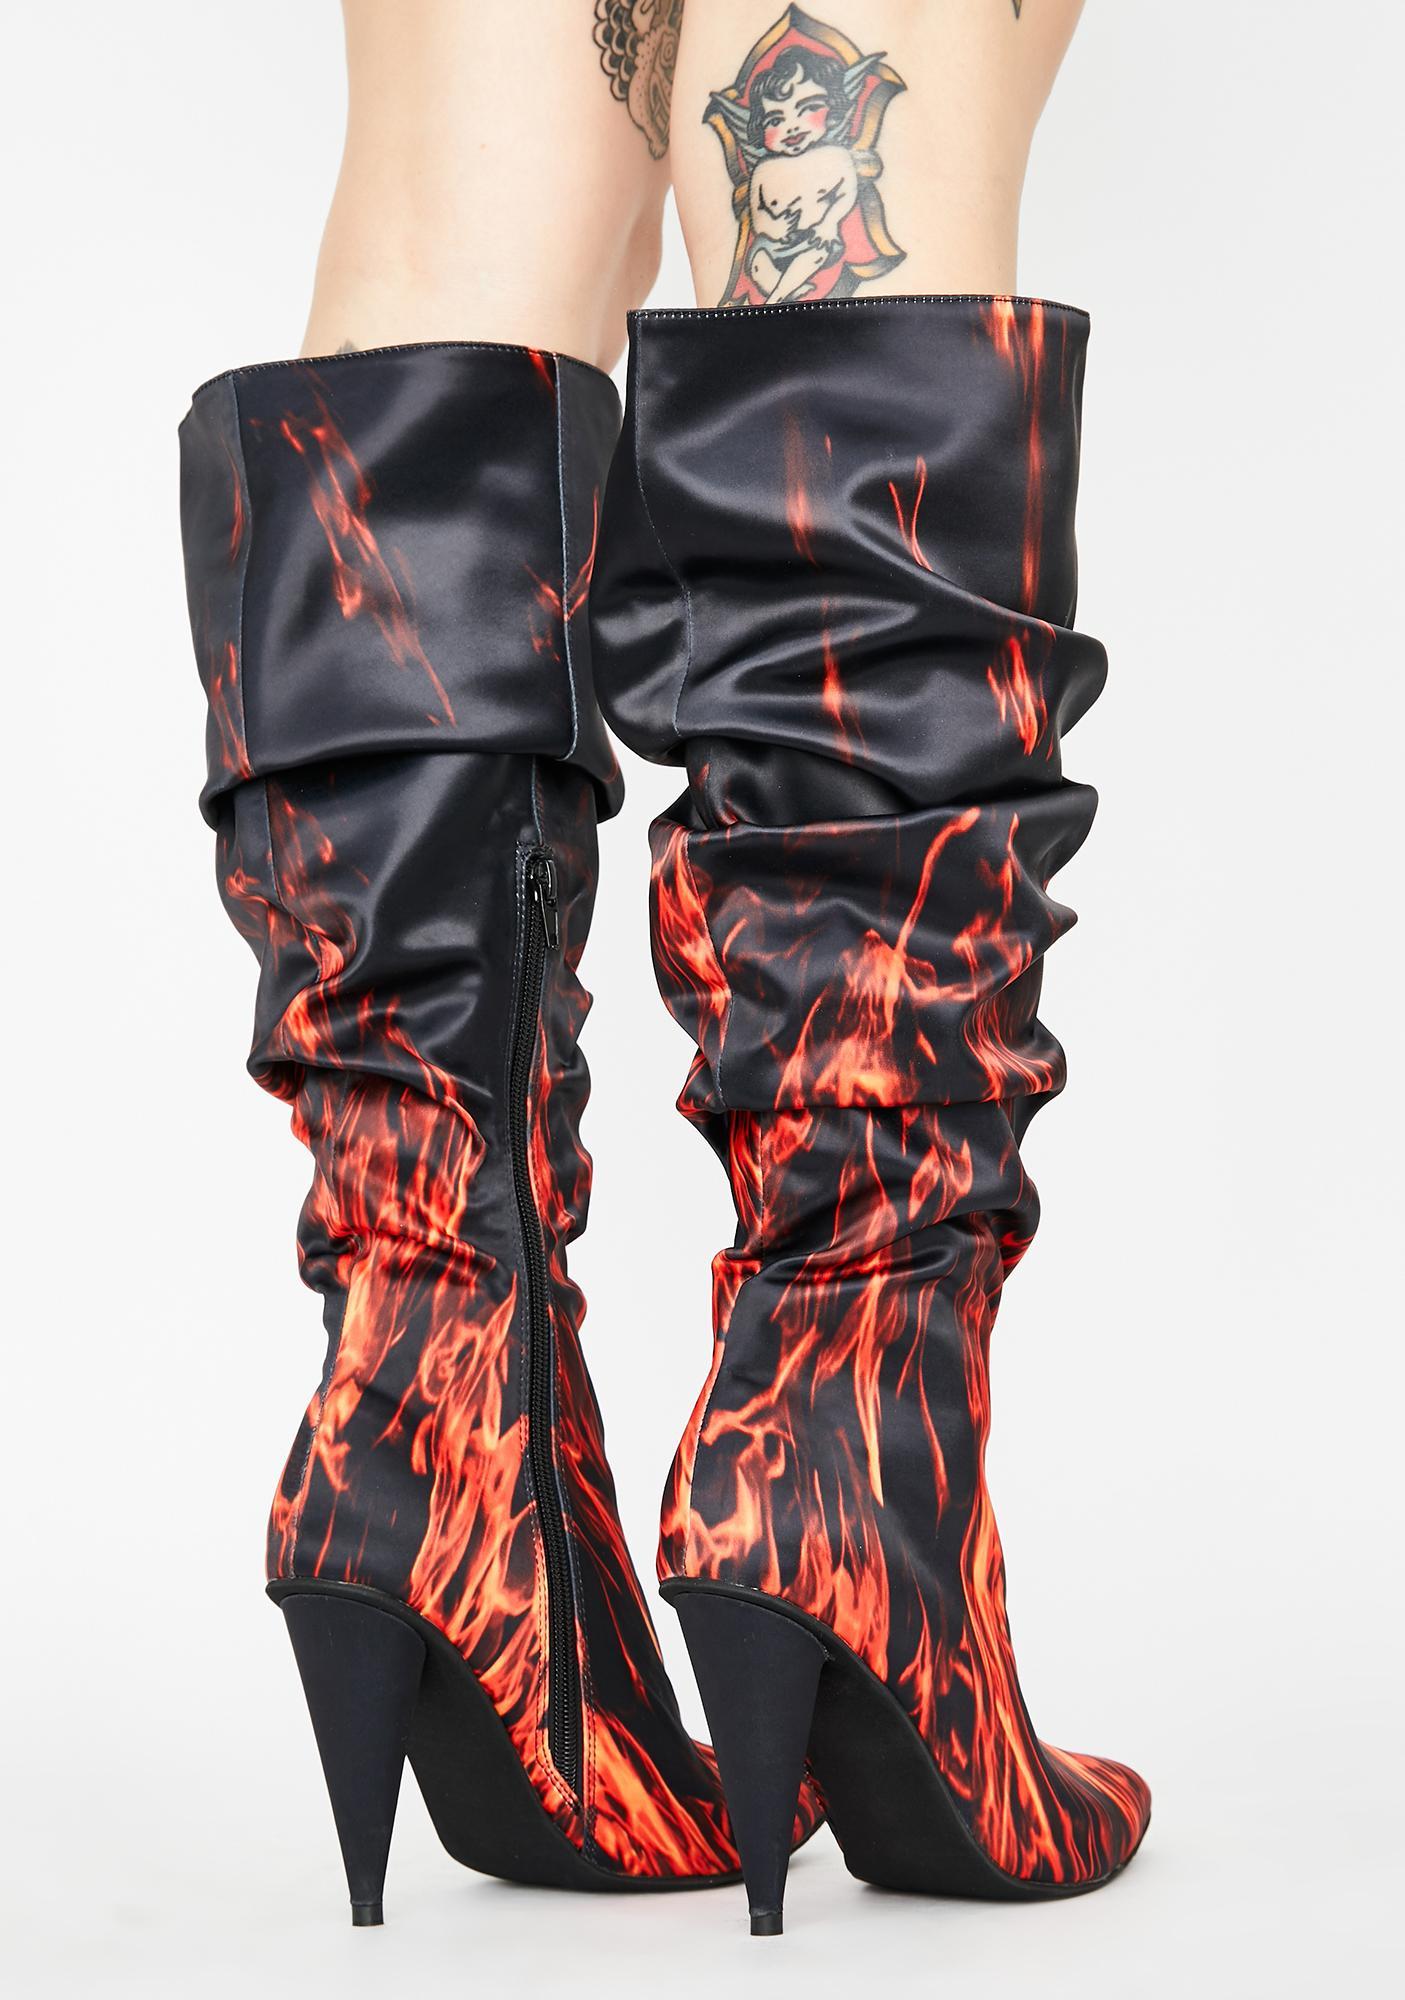 HOROSCOPEZ Blazing Glory Knee High Boots